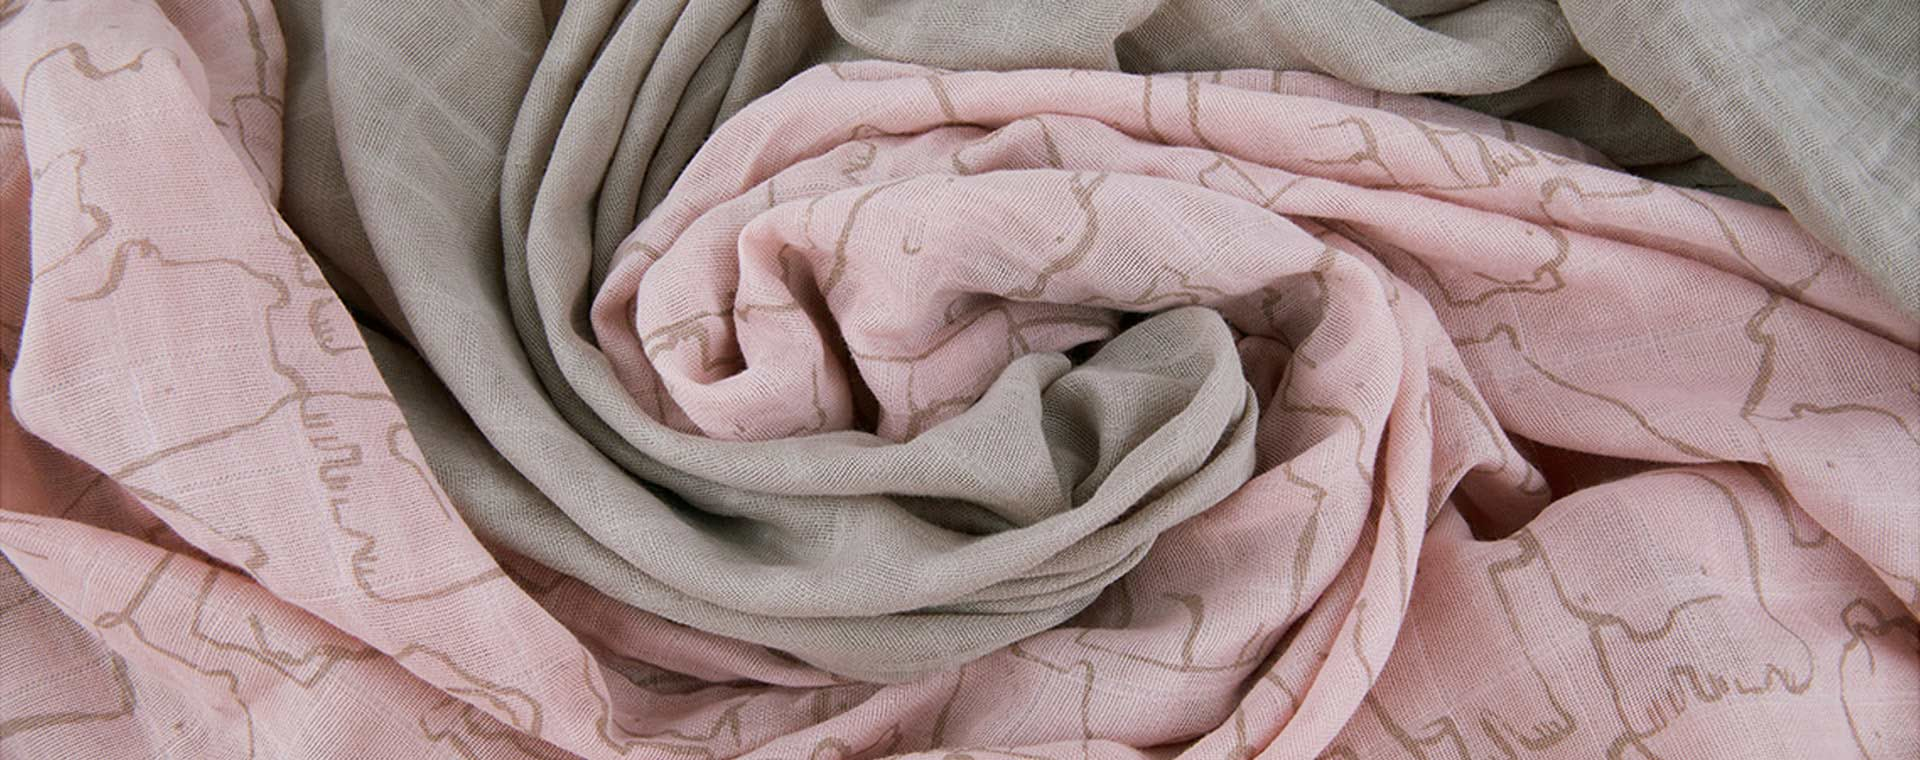 Bear KIDLY Label 2-Pack Swaddle Blankets